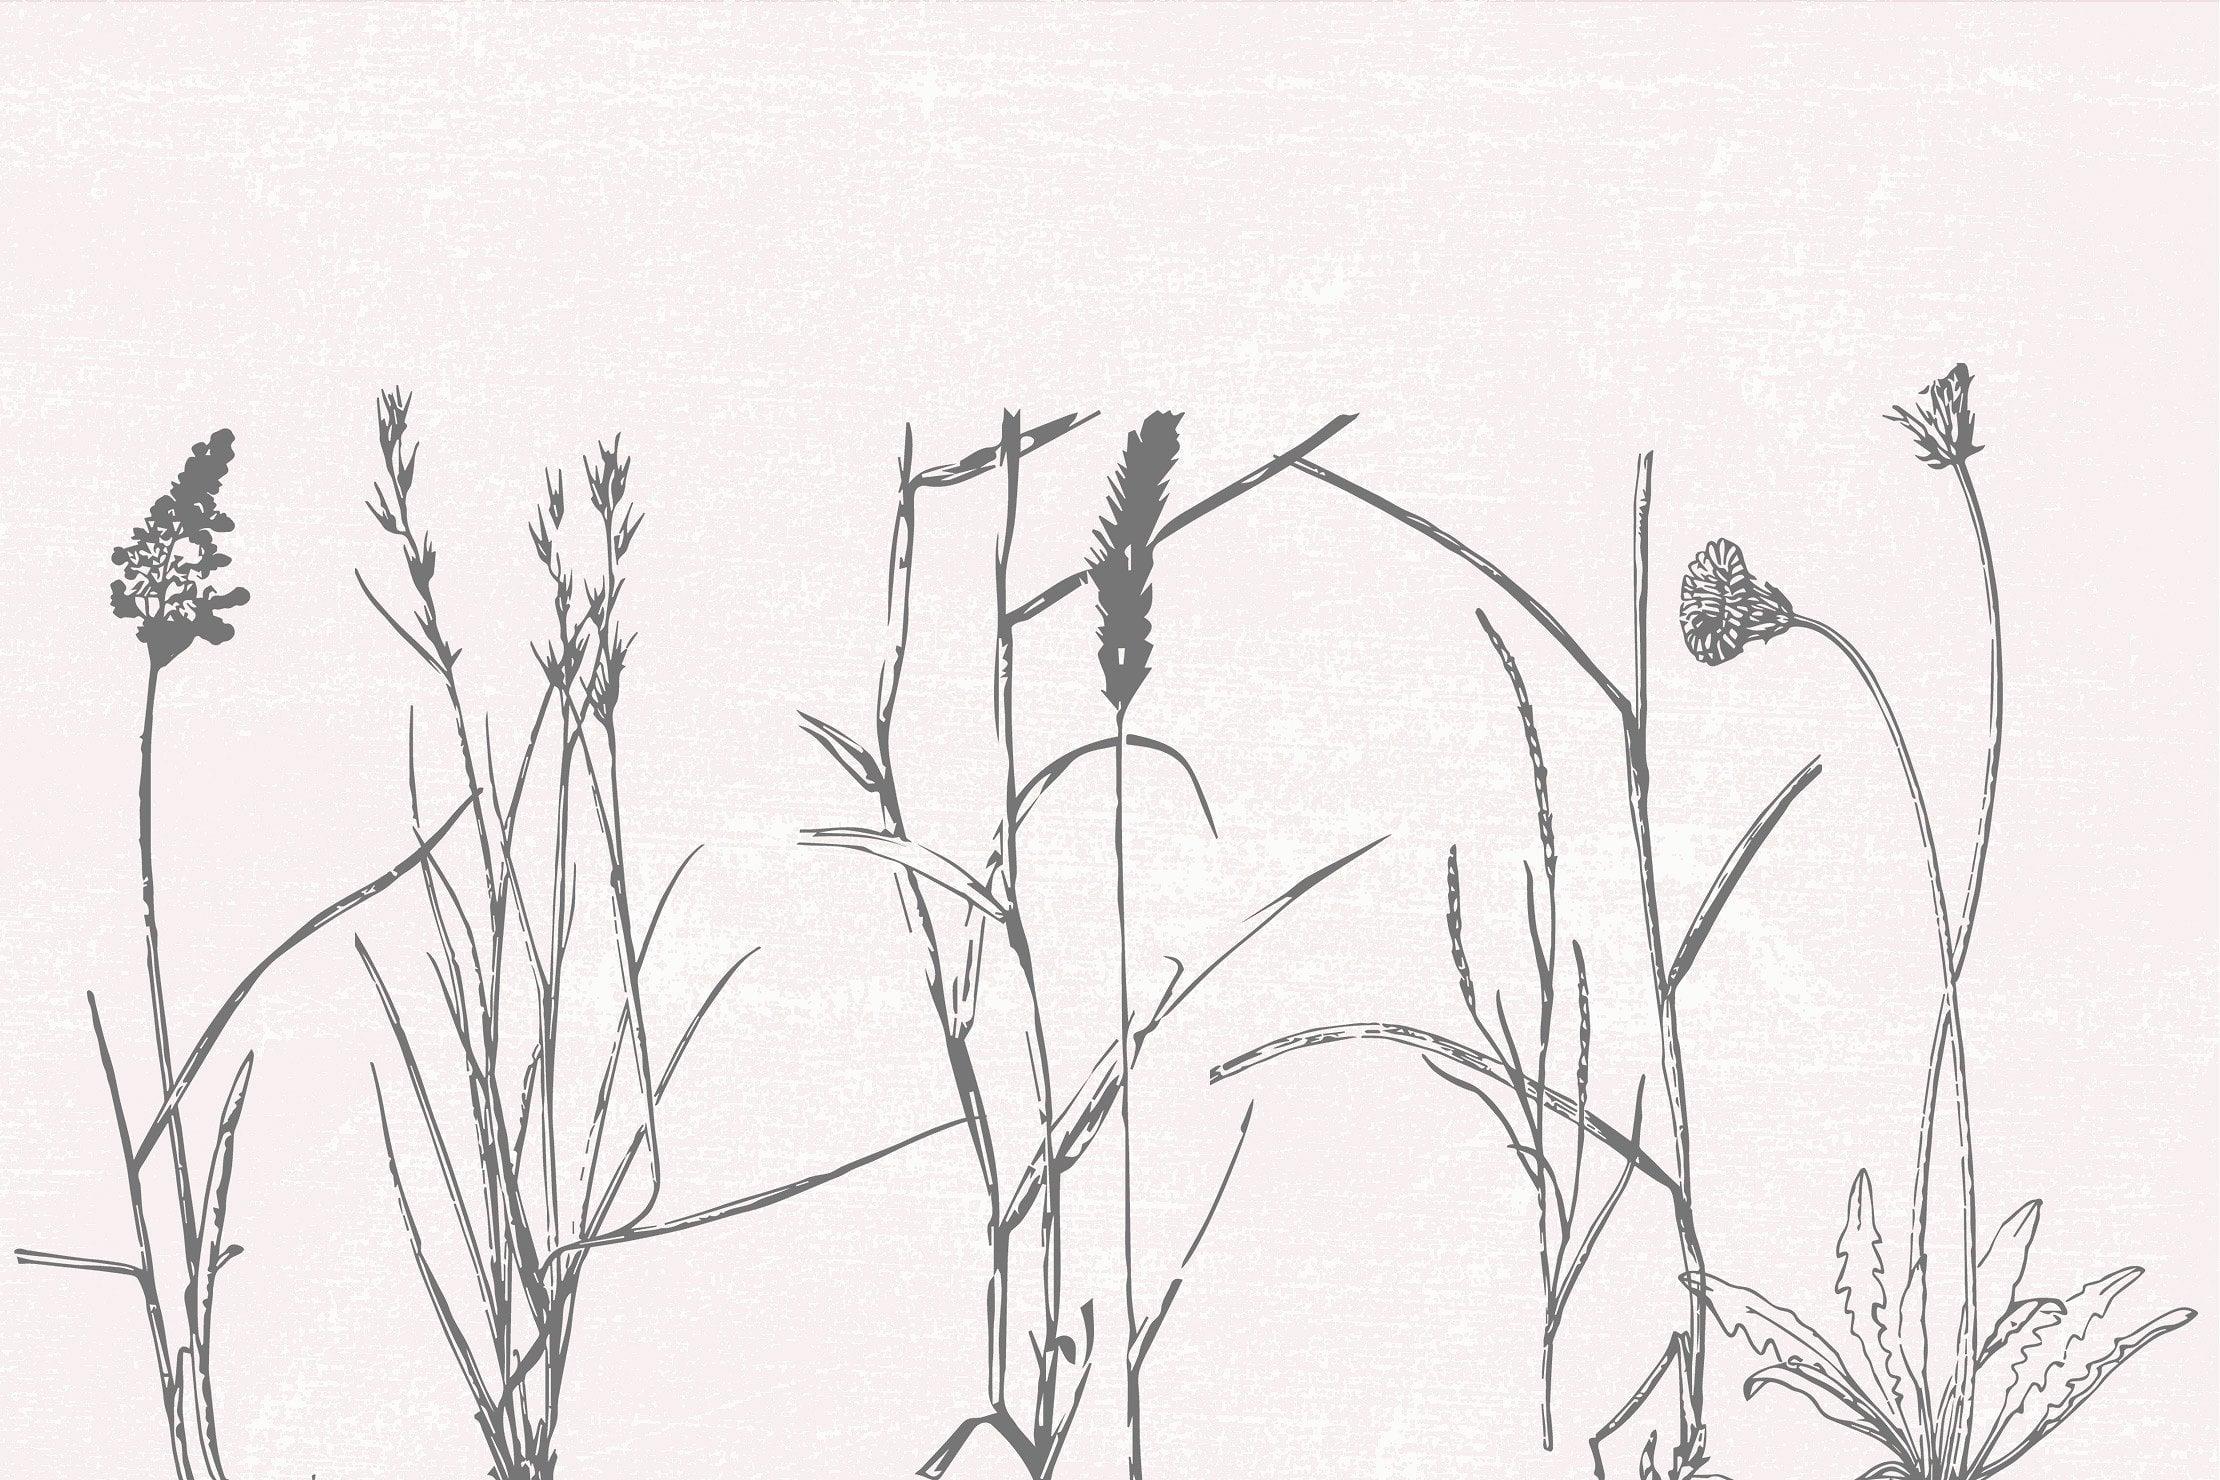 Field plants on a pastel background.